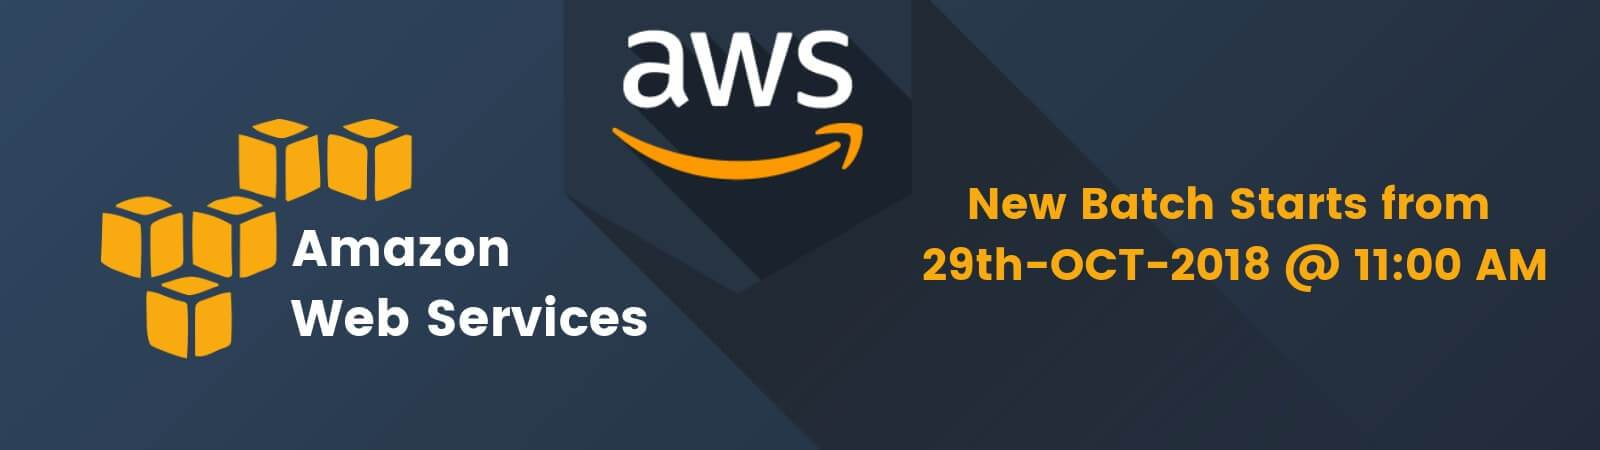 AWS New Batch 29th-OCT-2018 Banner